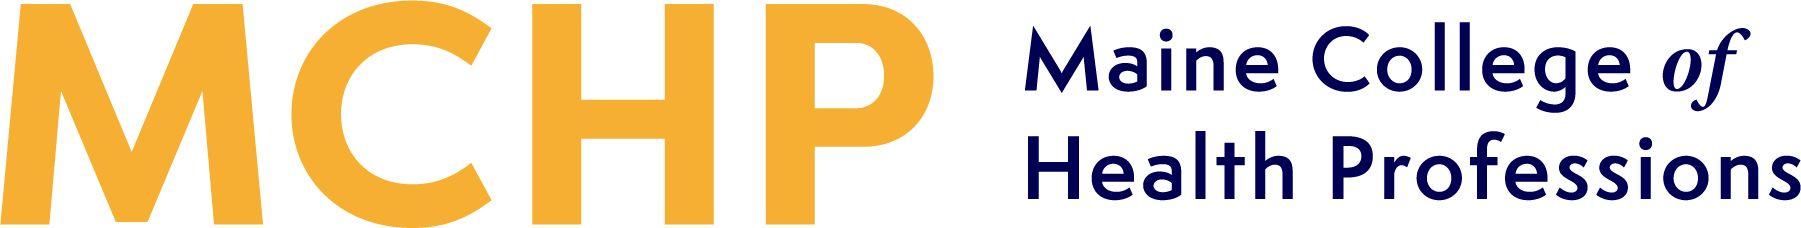 MCHP Logo